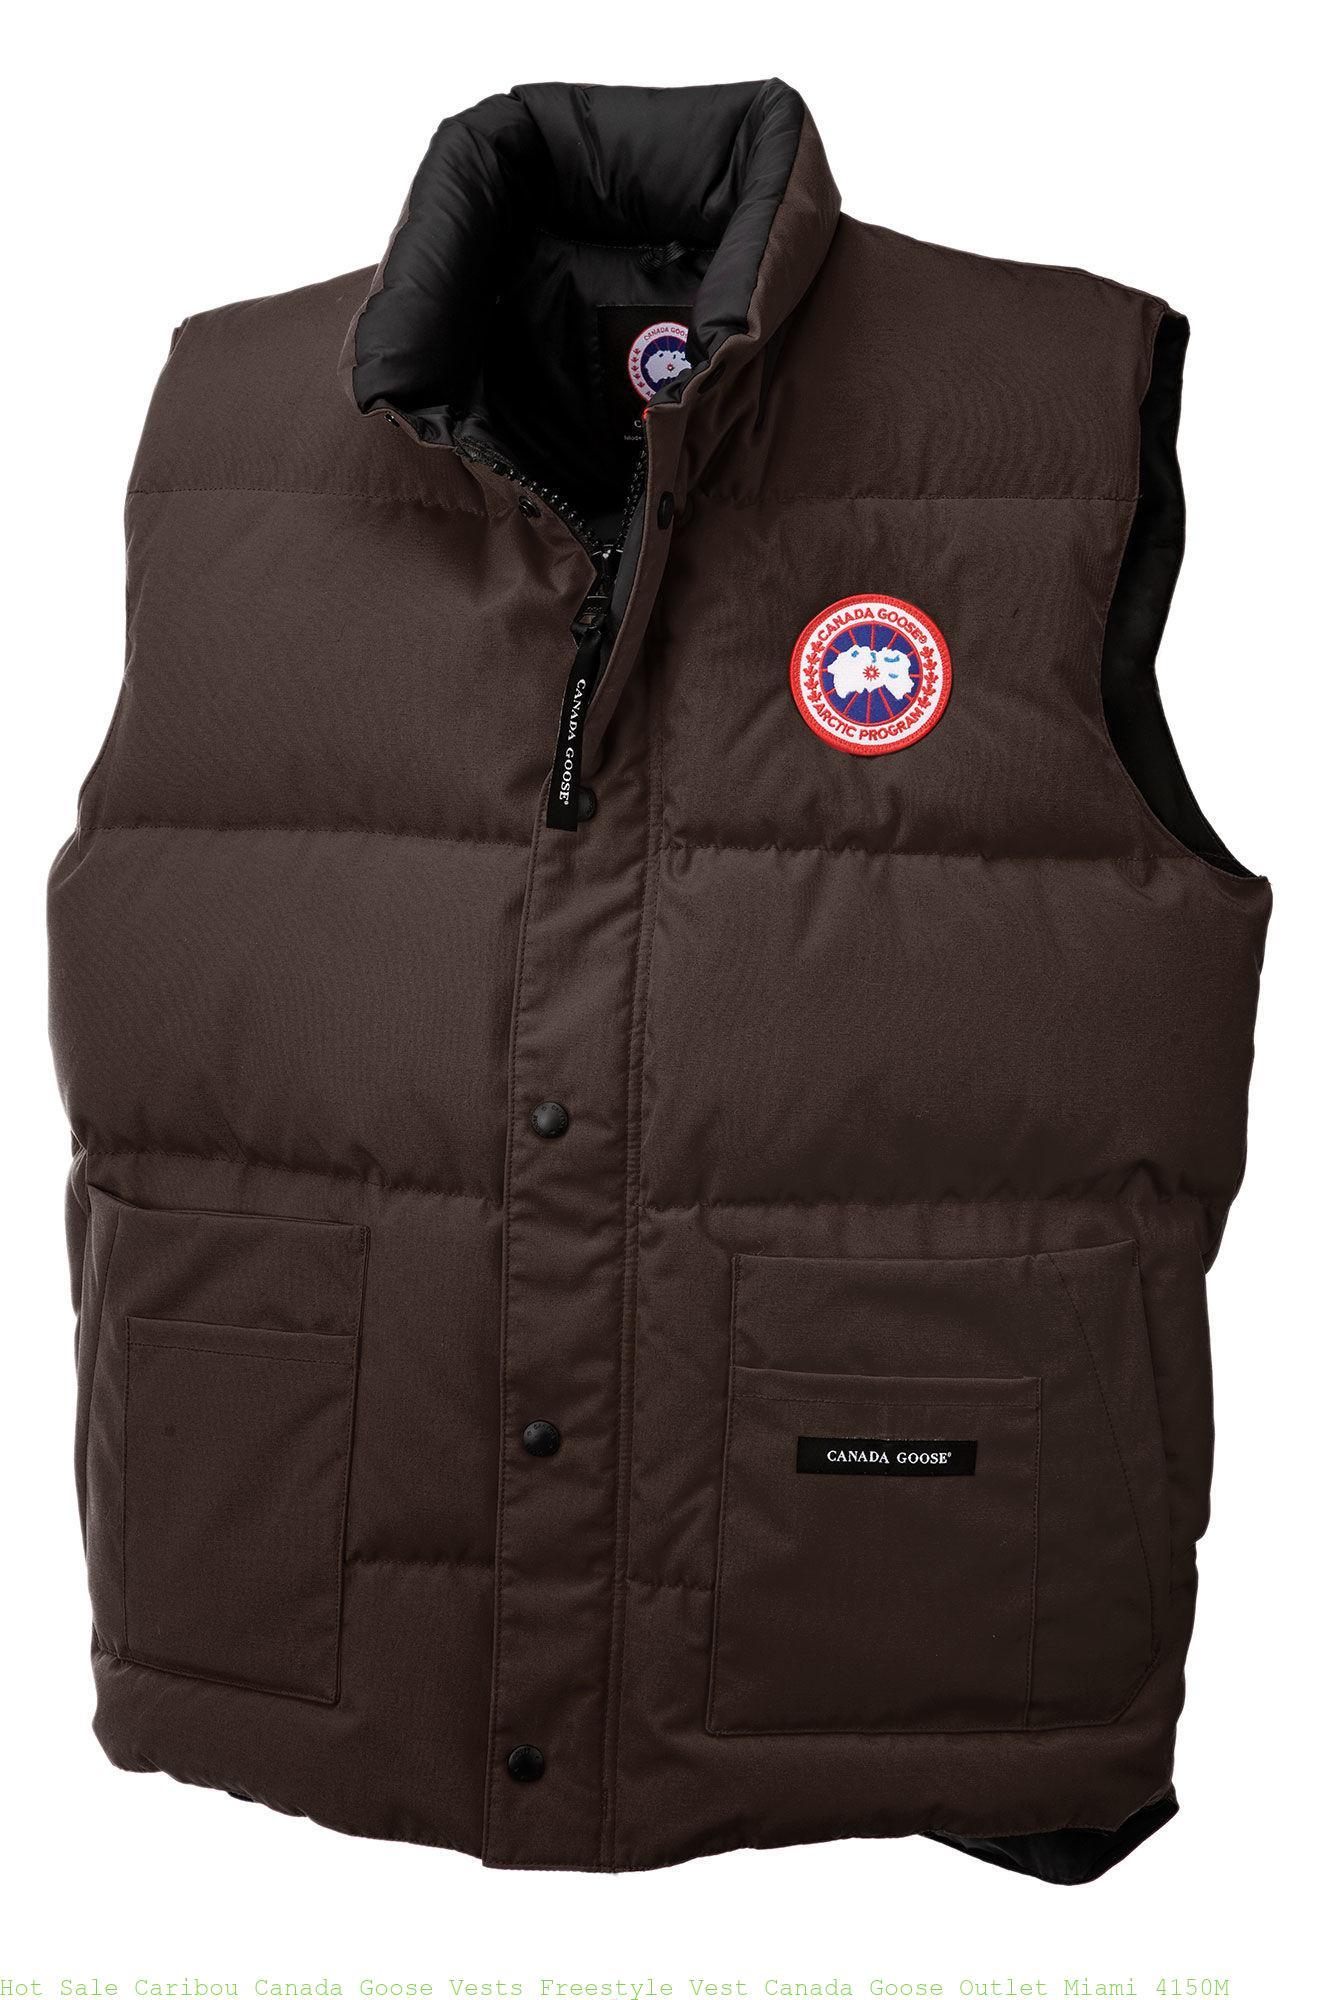 24af66e0944 Hot Sale Caribou Canada Goose Vests Freestyle Vest Canada Goose Outlet  Miami 4150M – Cheap Canada Goose Outlet Jackets Online Sale Store